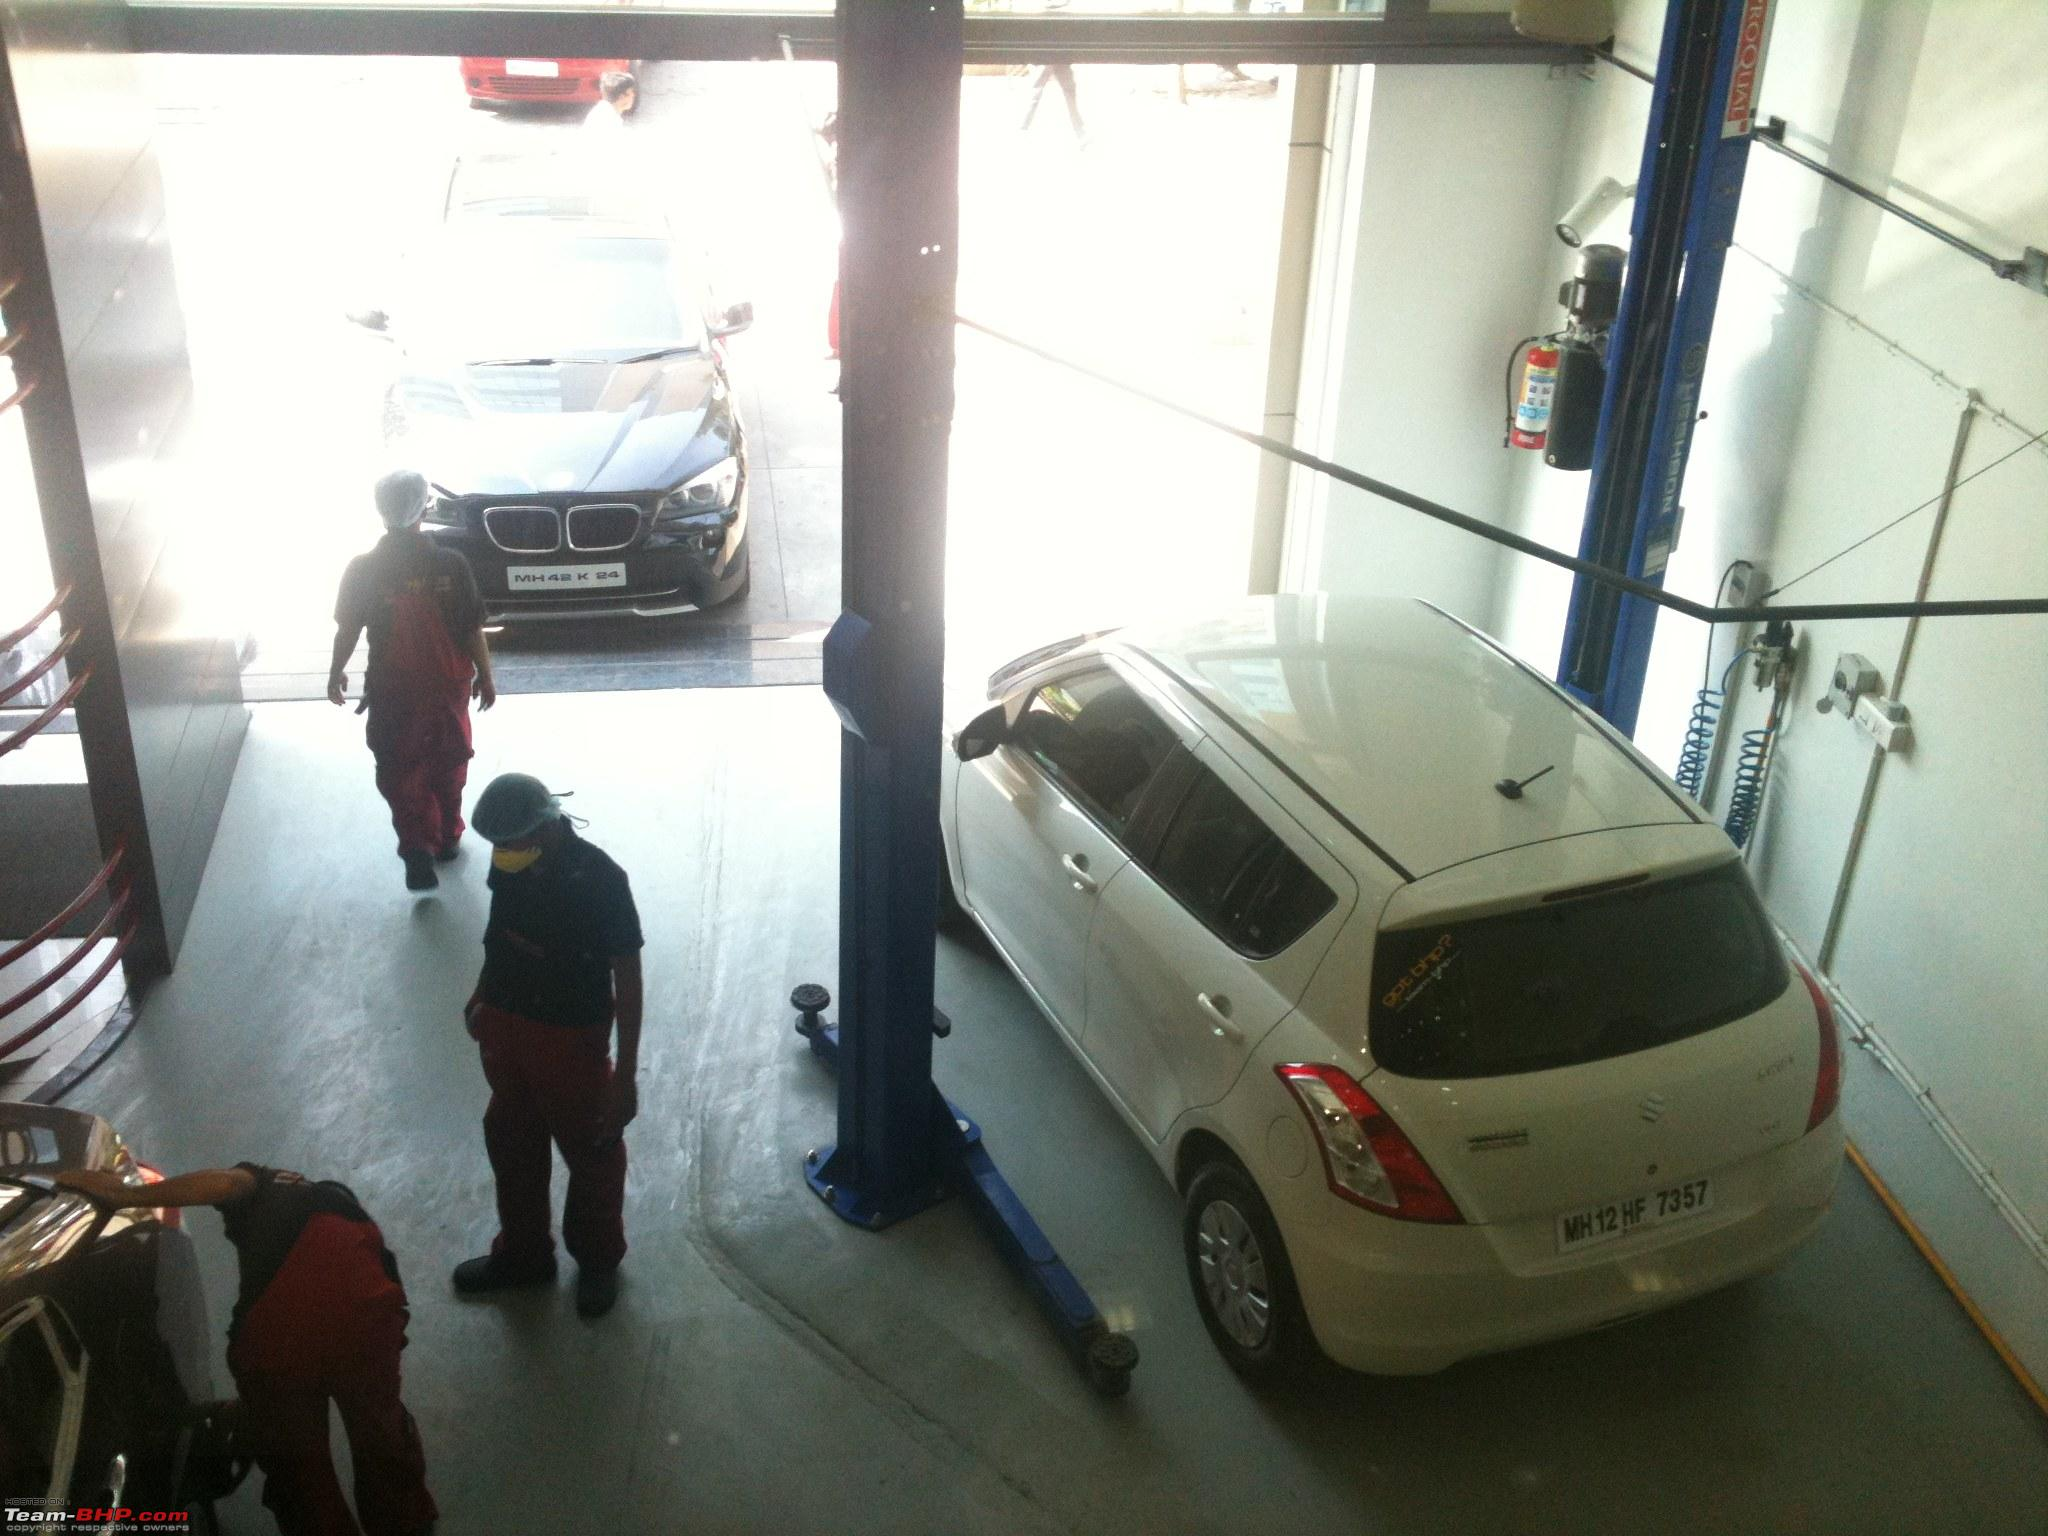 3m car care pune deals / Khaugalideals hyderabad